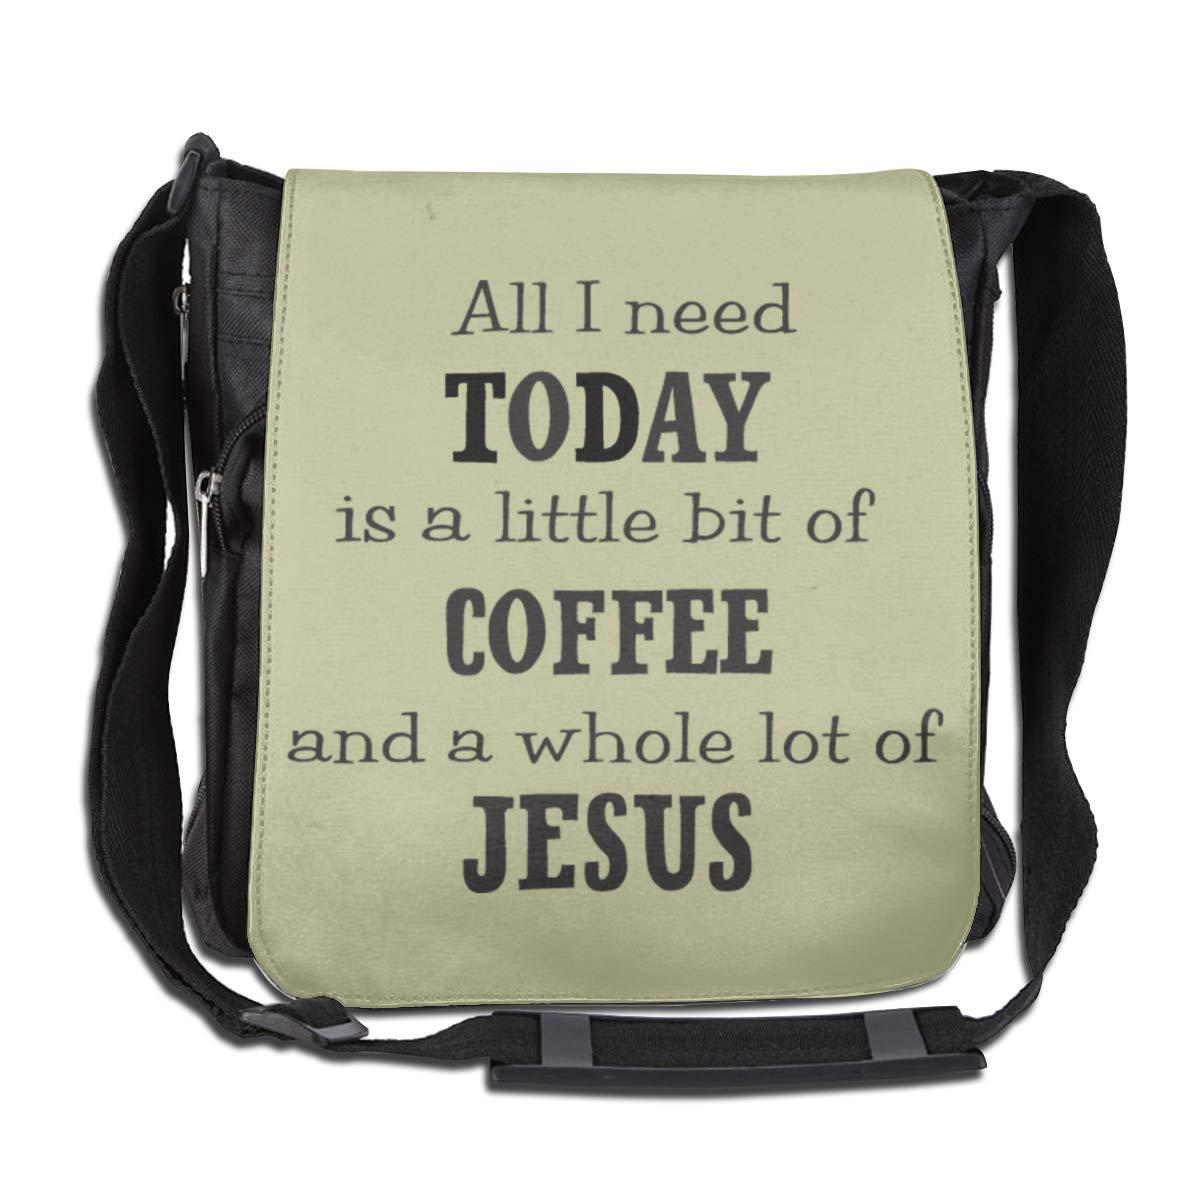 Coffee and Jesus Fashion Diagonal Single Shoulder Workout Bag